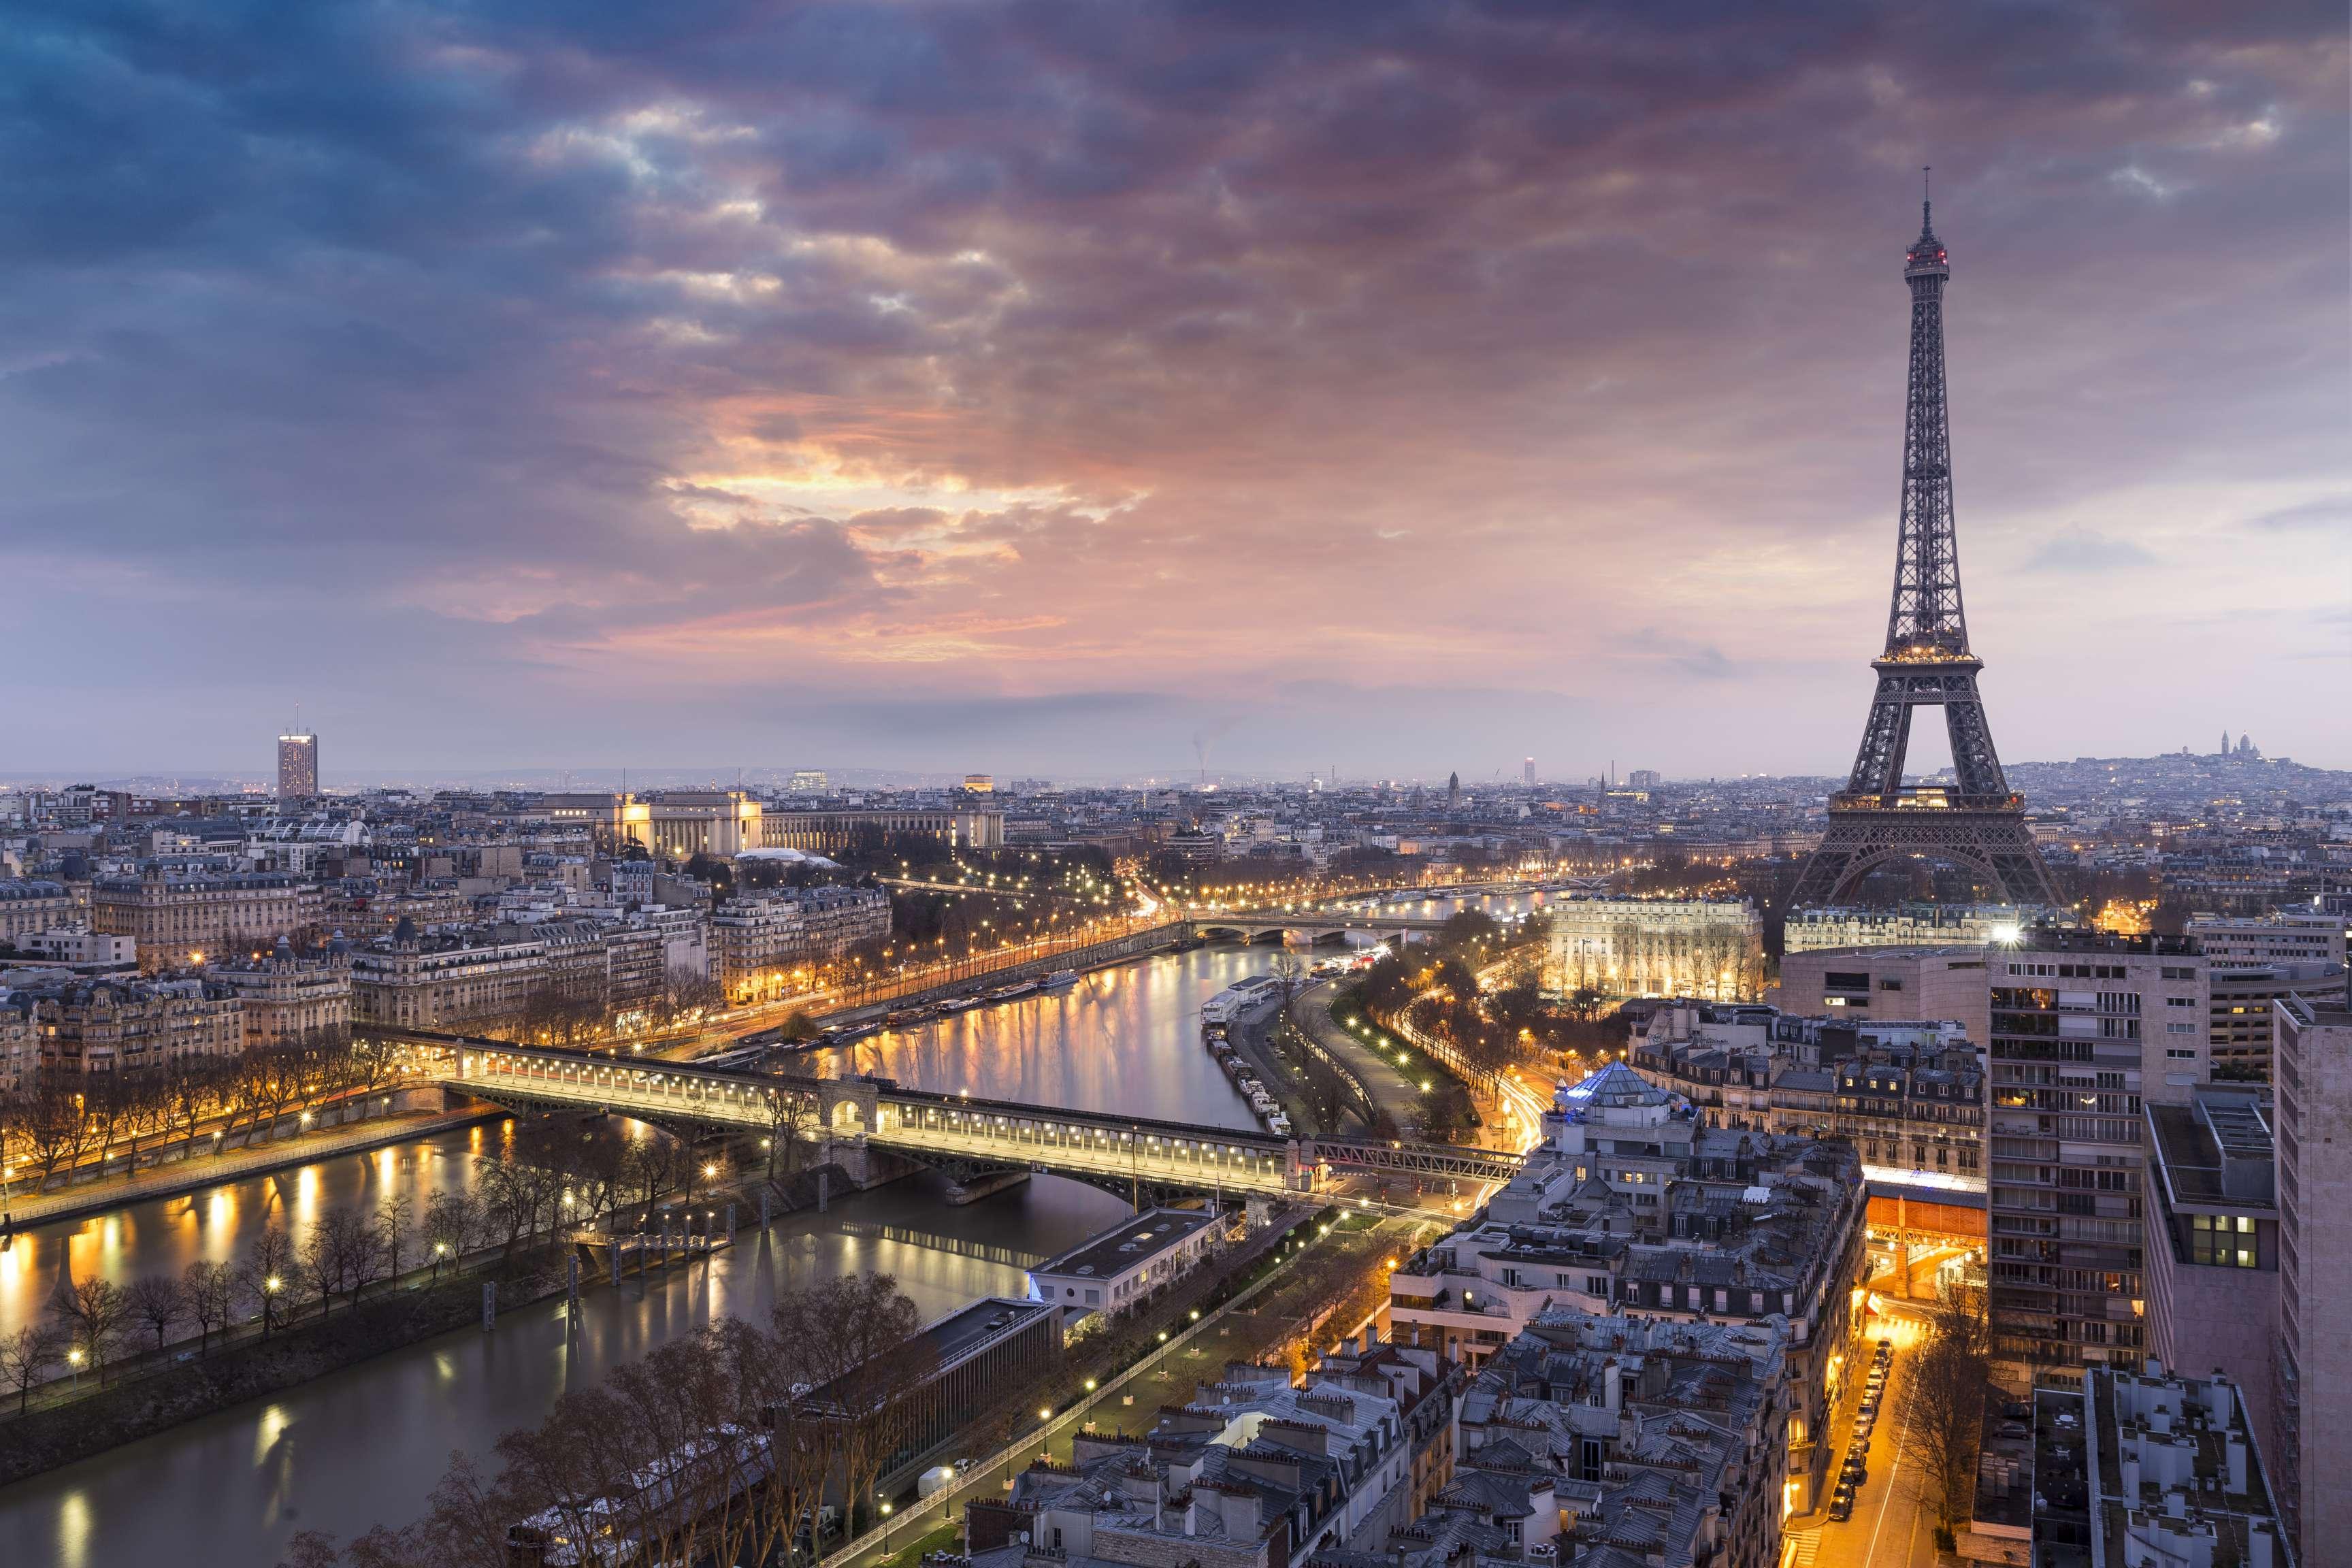 Paris At Night Discover For Yourself U0026 39 The City Of Light U0026 39